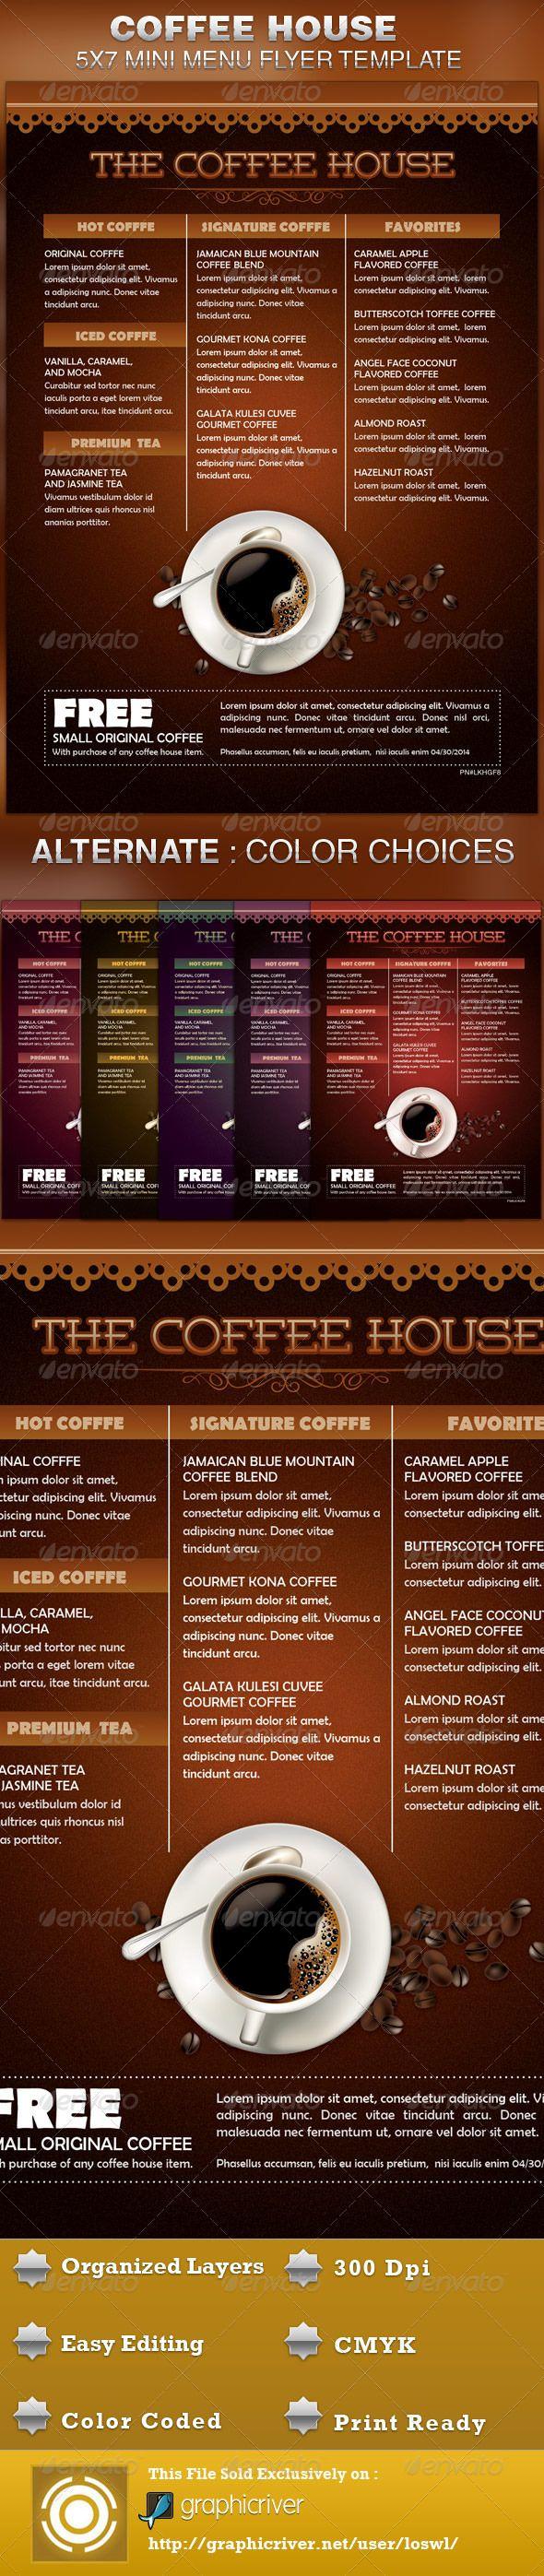 Coffee House Mini Menu Flyer Template